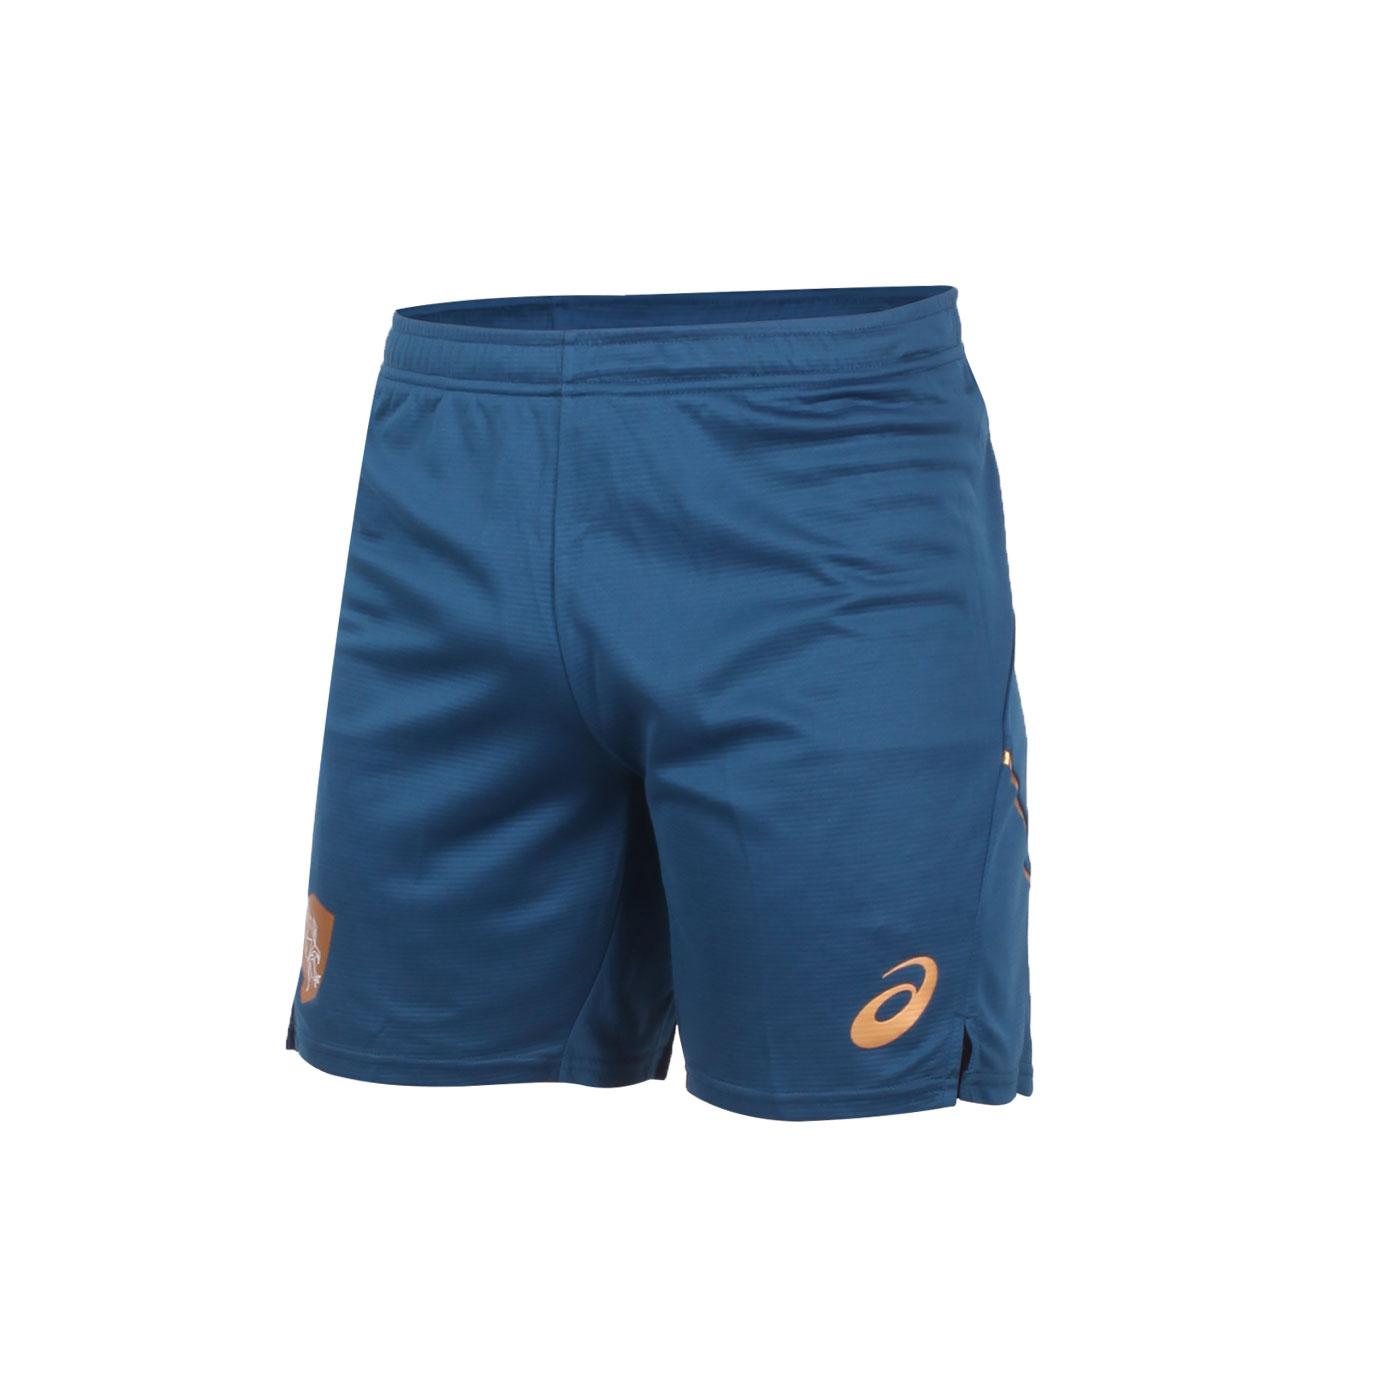 ASICS 男款針織短褲 2051A248-001 - 墨藍金